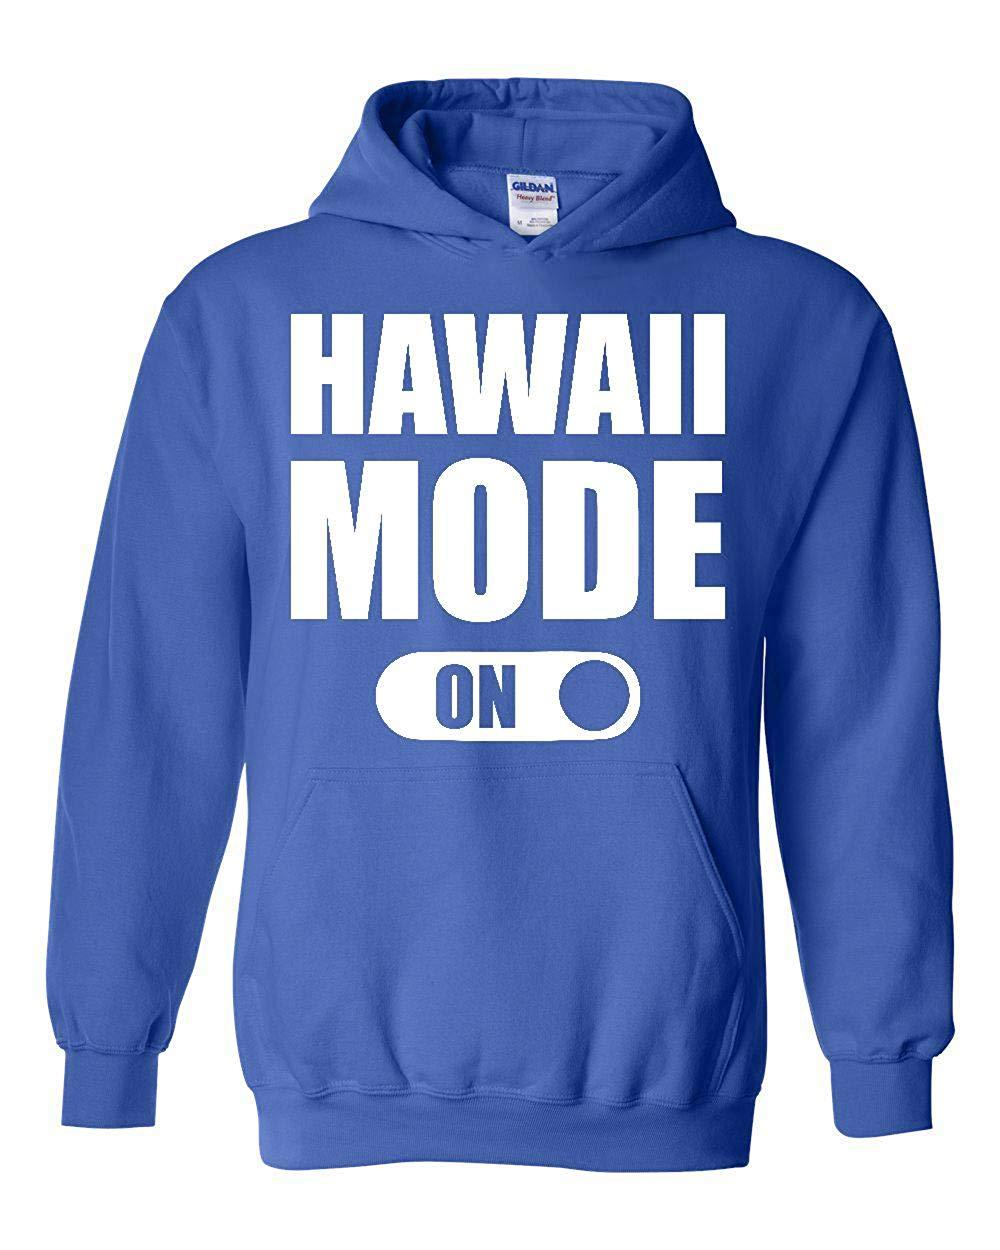 Hawaii Modus Auf Honolulu Maui Hawaiian Inseln Unisex Hoodie Sweatshirt (3XLRB) Royal Blau Unisex männer frauen hoodie